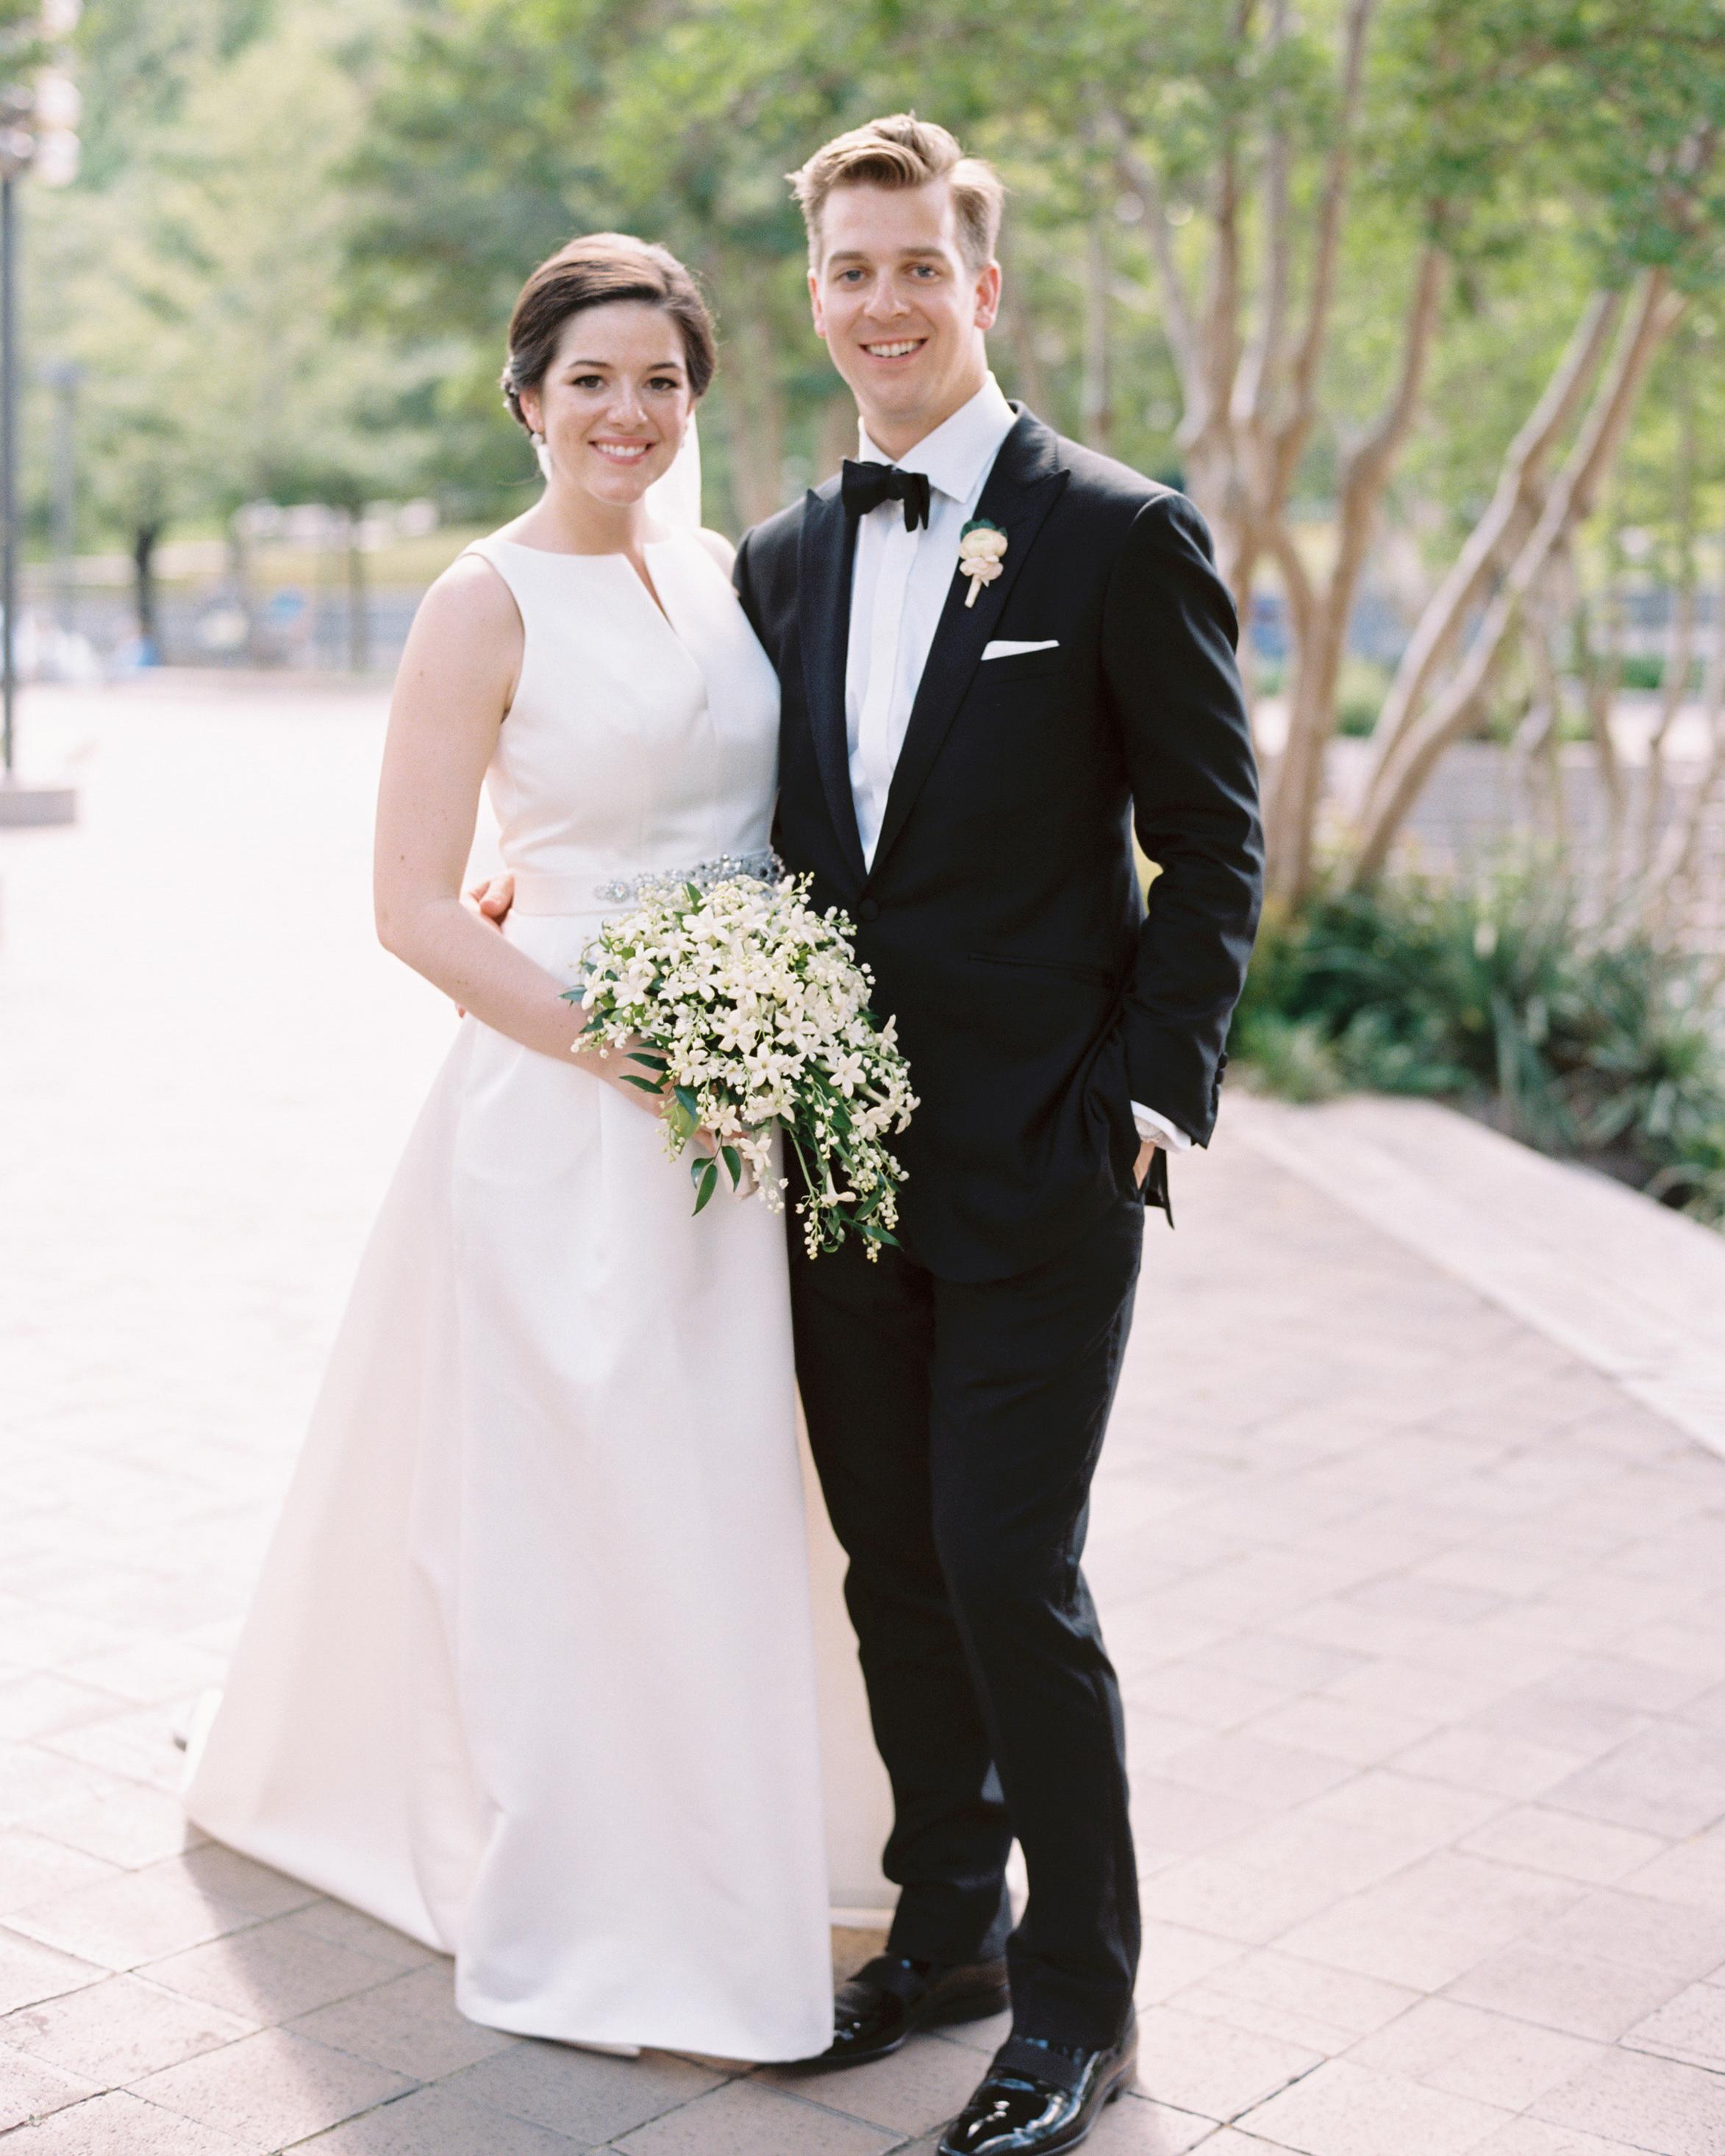 taylor-john-wedding-couple-314-s112507-0116.jpg